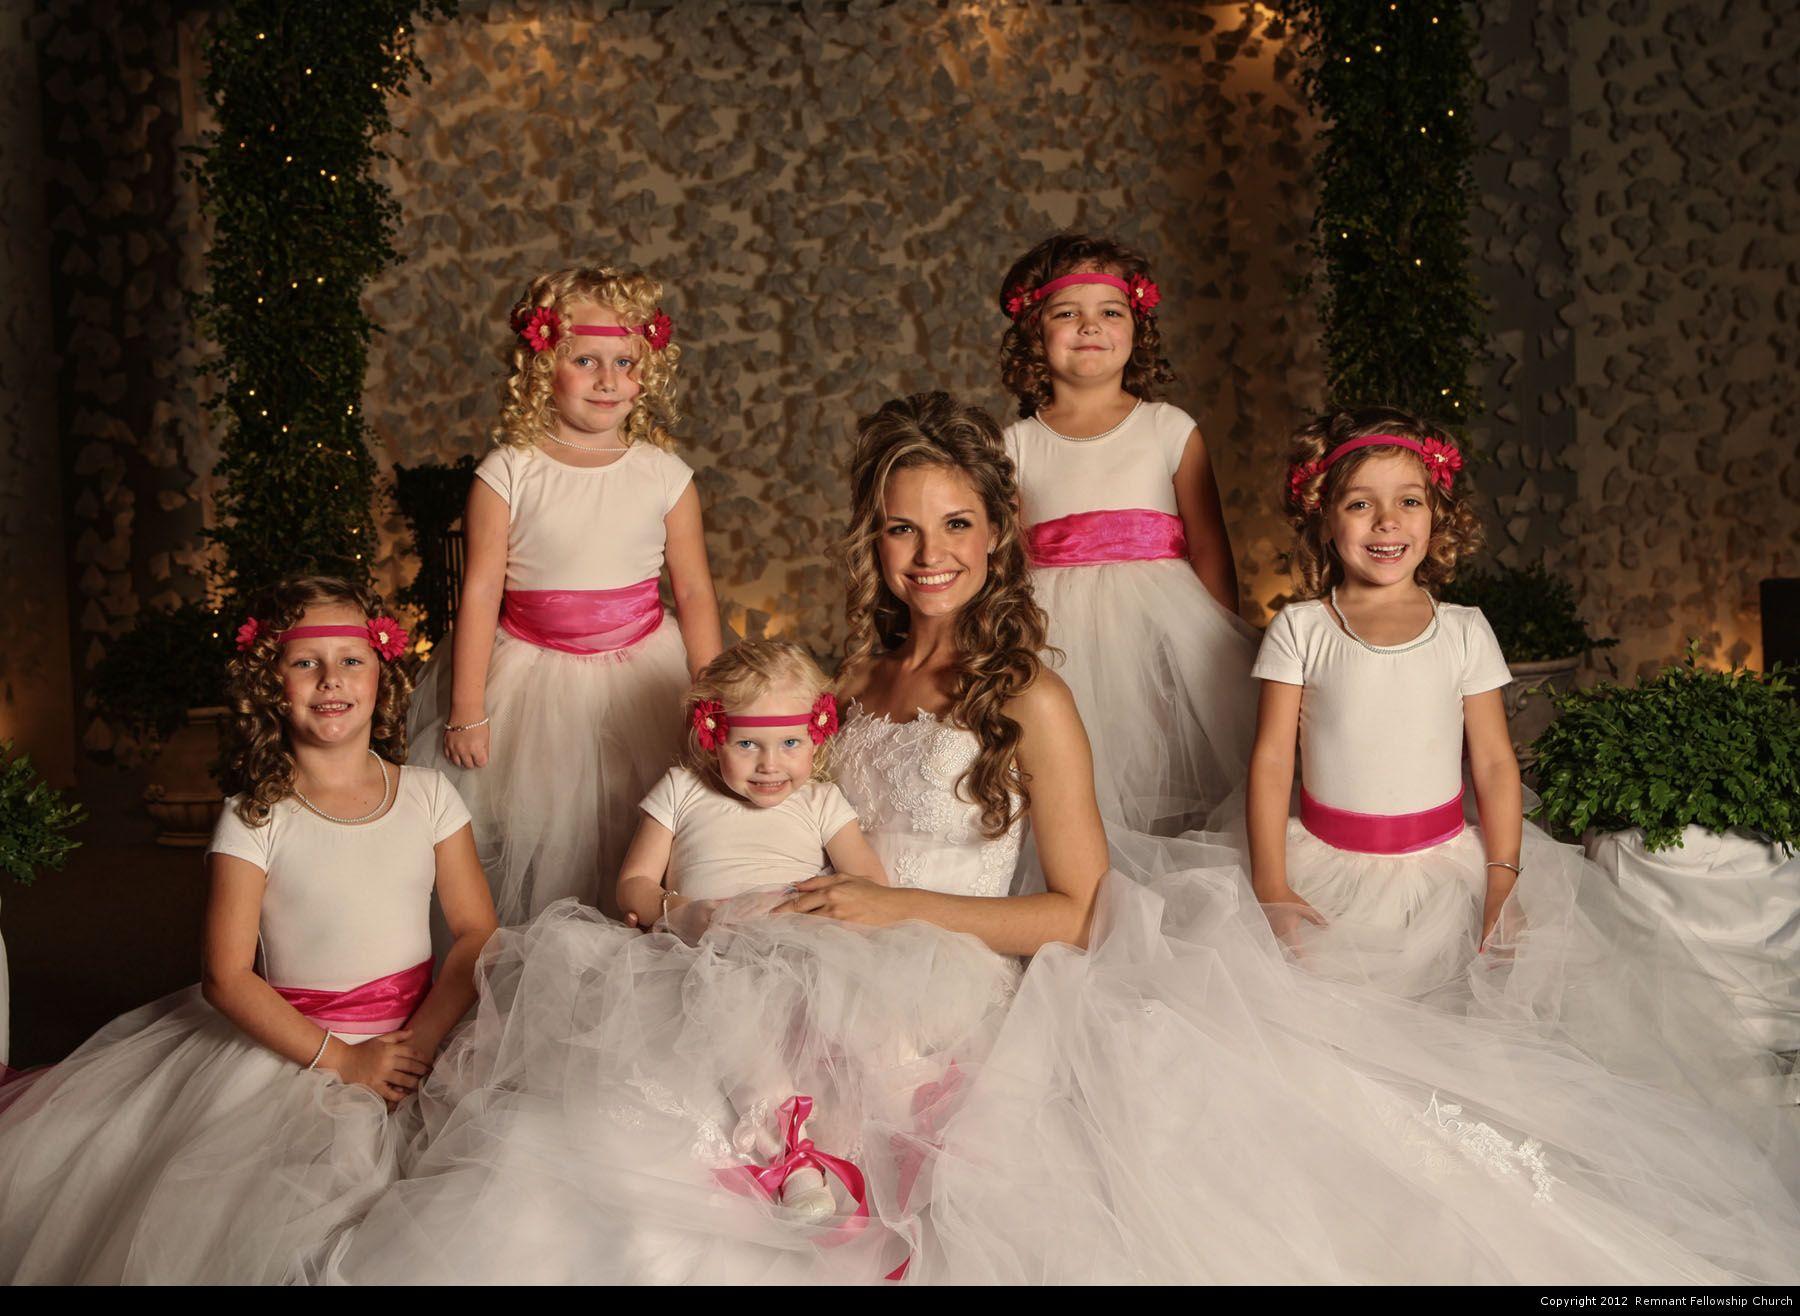 Homonnay Wedding - Bride with Flower Girls